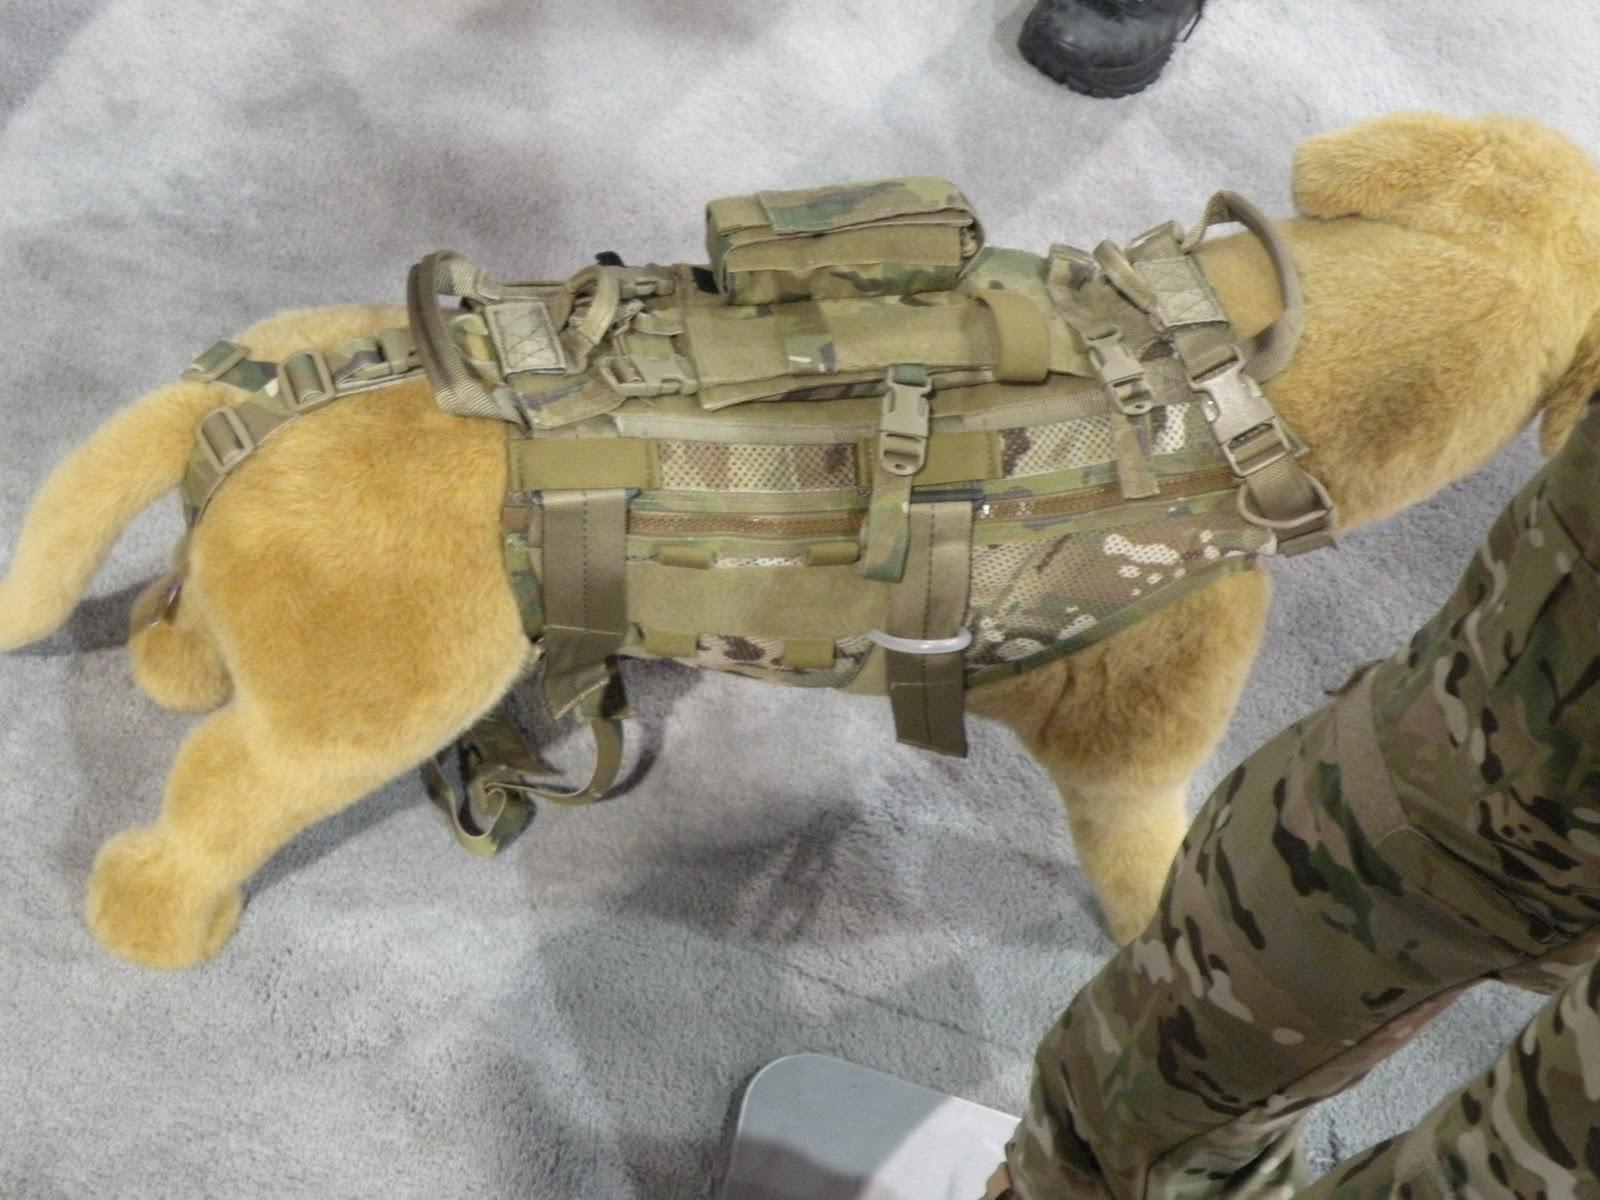 Tactical dog vest - photo#14